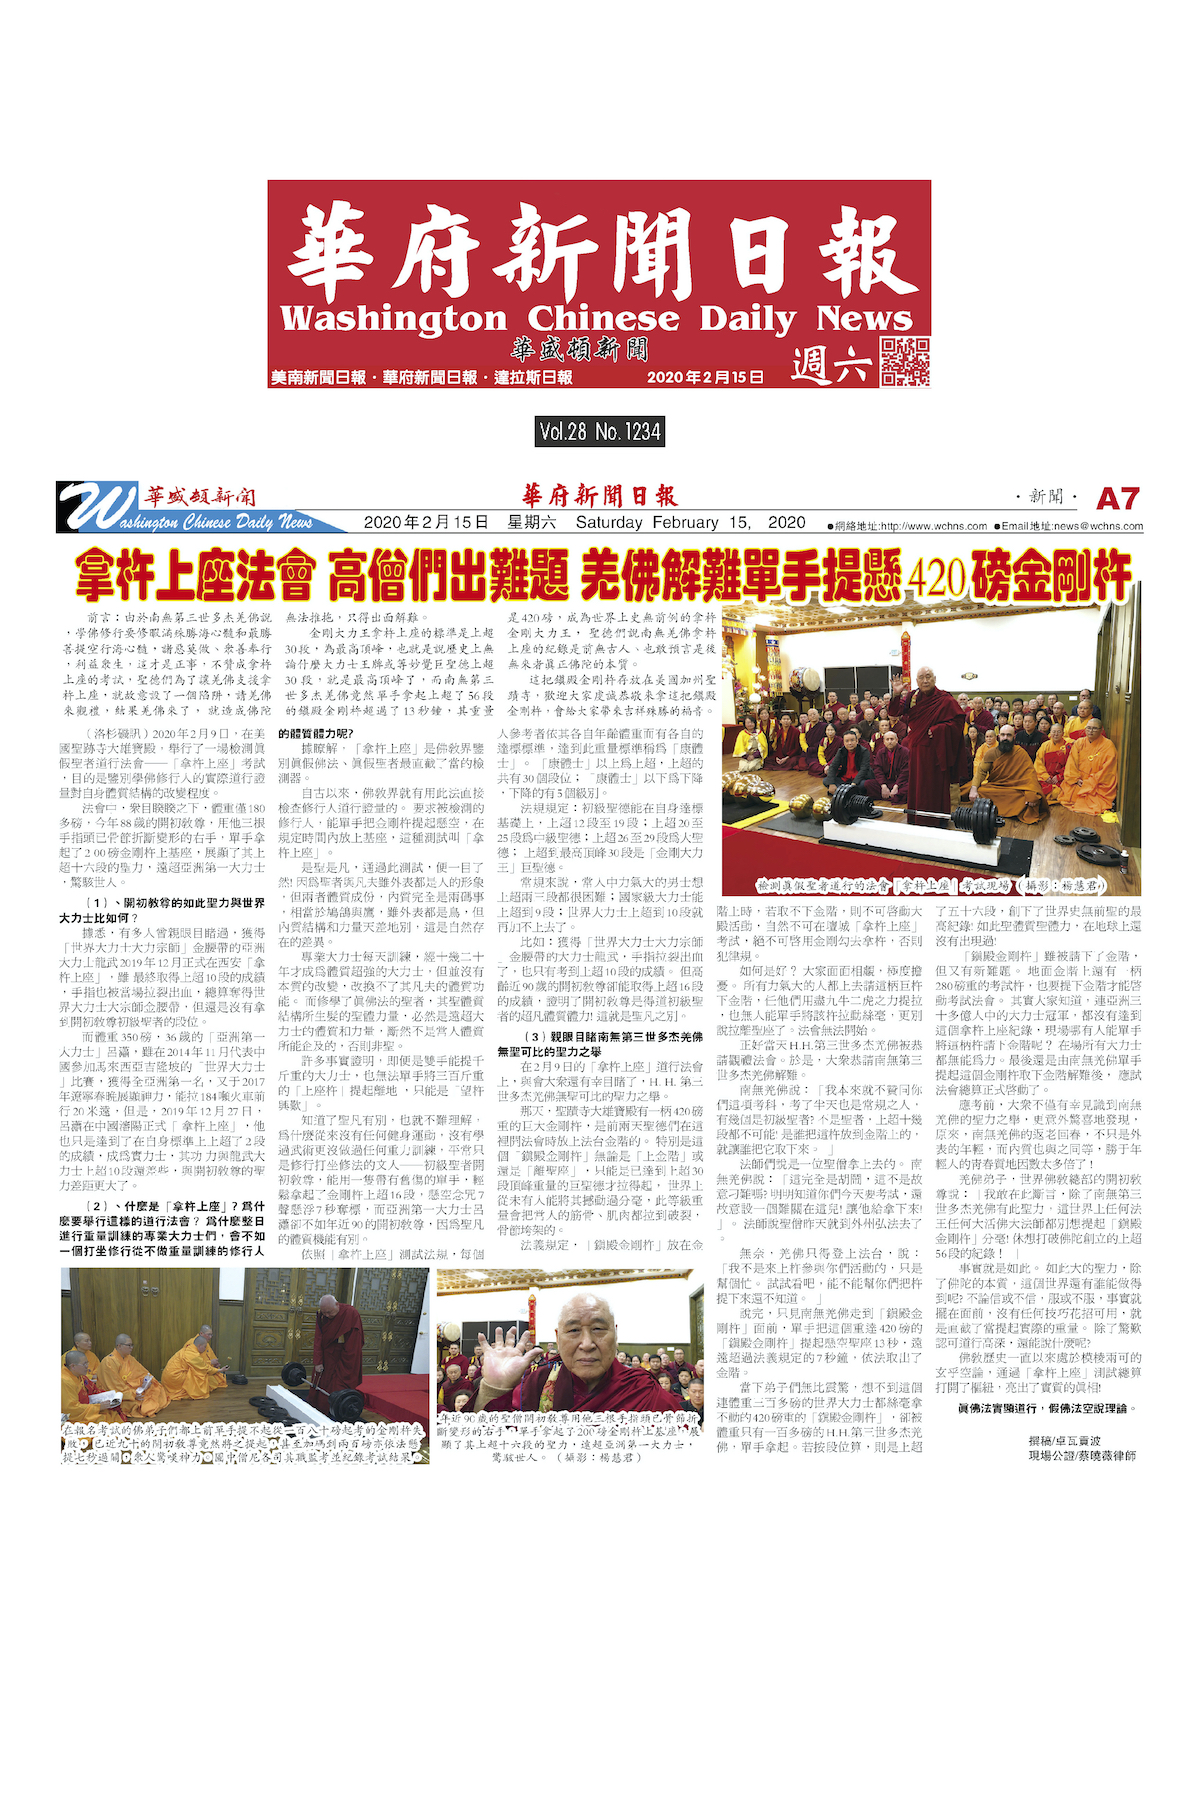 s_華府新聞日報-A7_2-15-2020_拿杵上座法會-高僧們出難題-羌佛解難單手提懸420磅金剛杵.